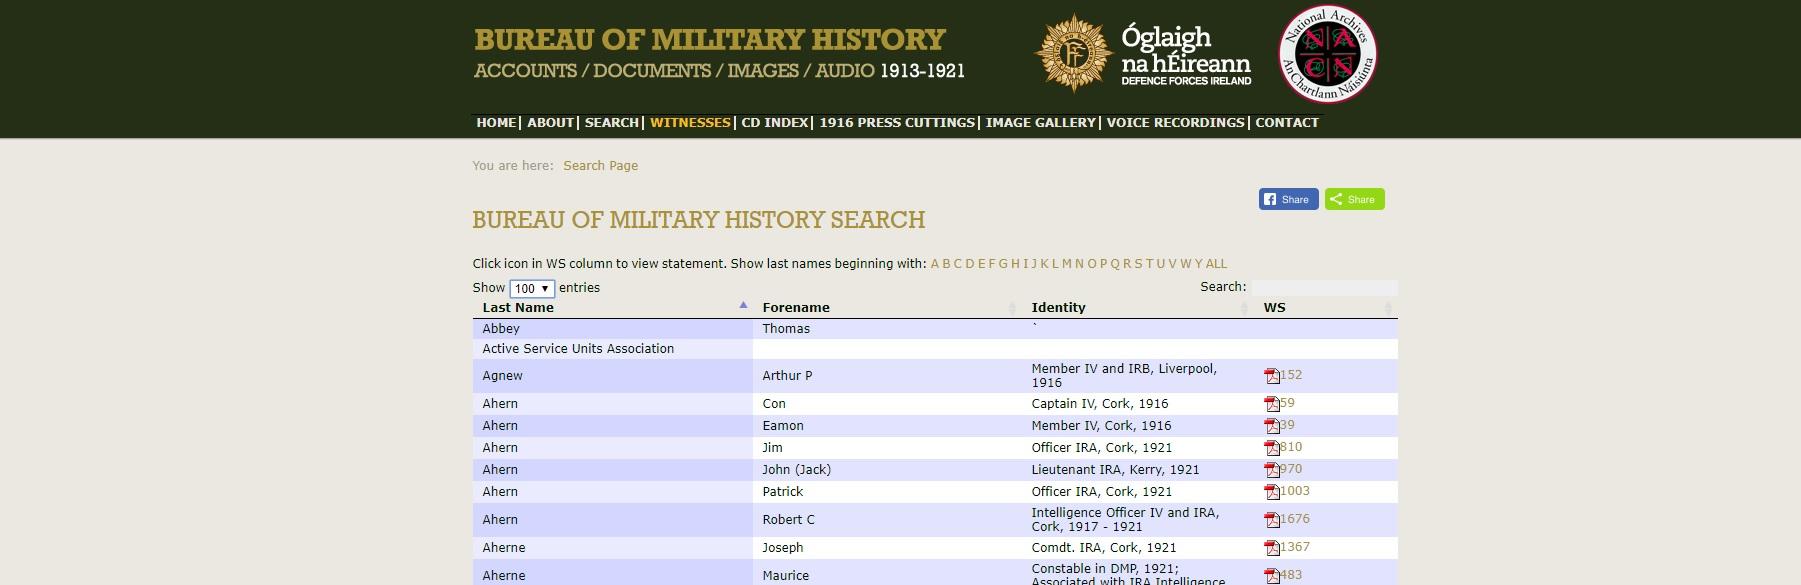 Military Bureau example printscreen.jpg